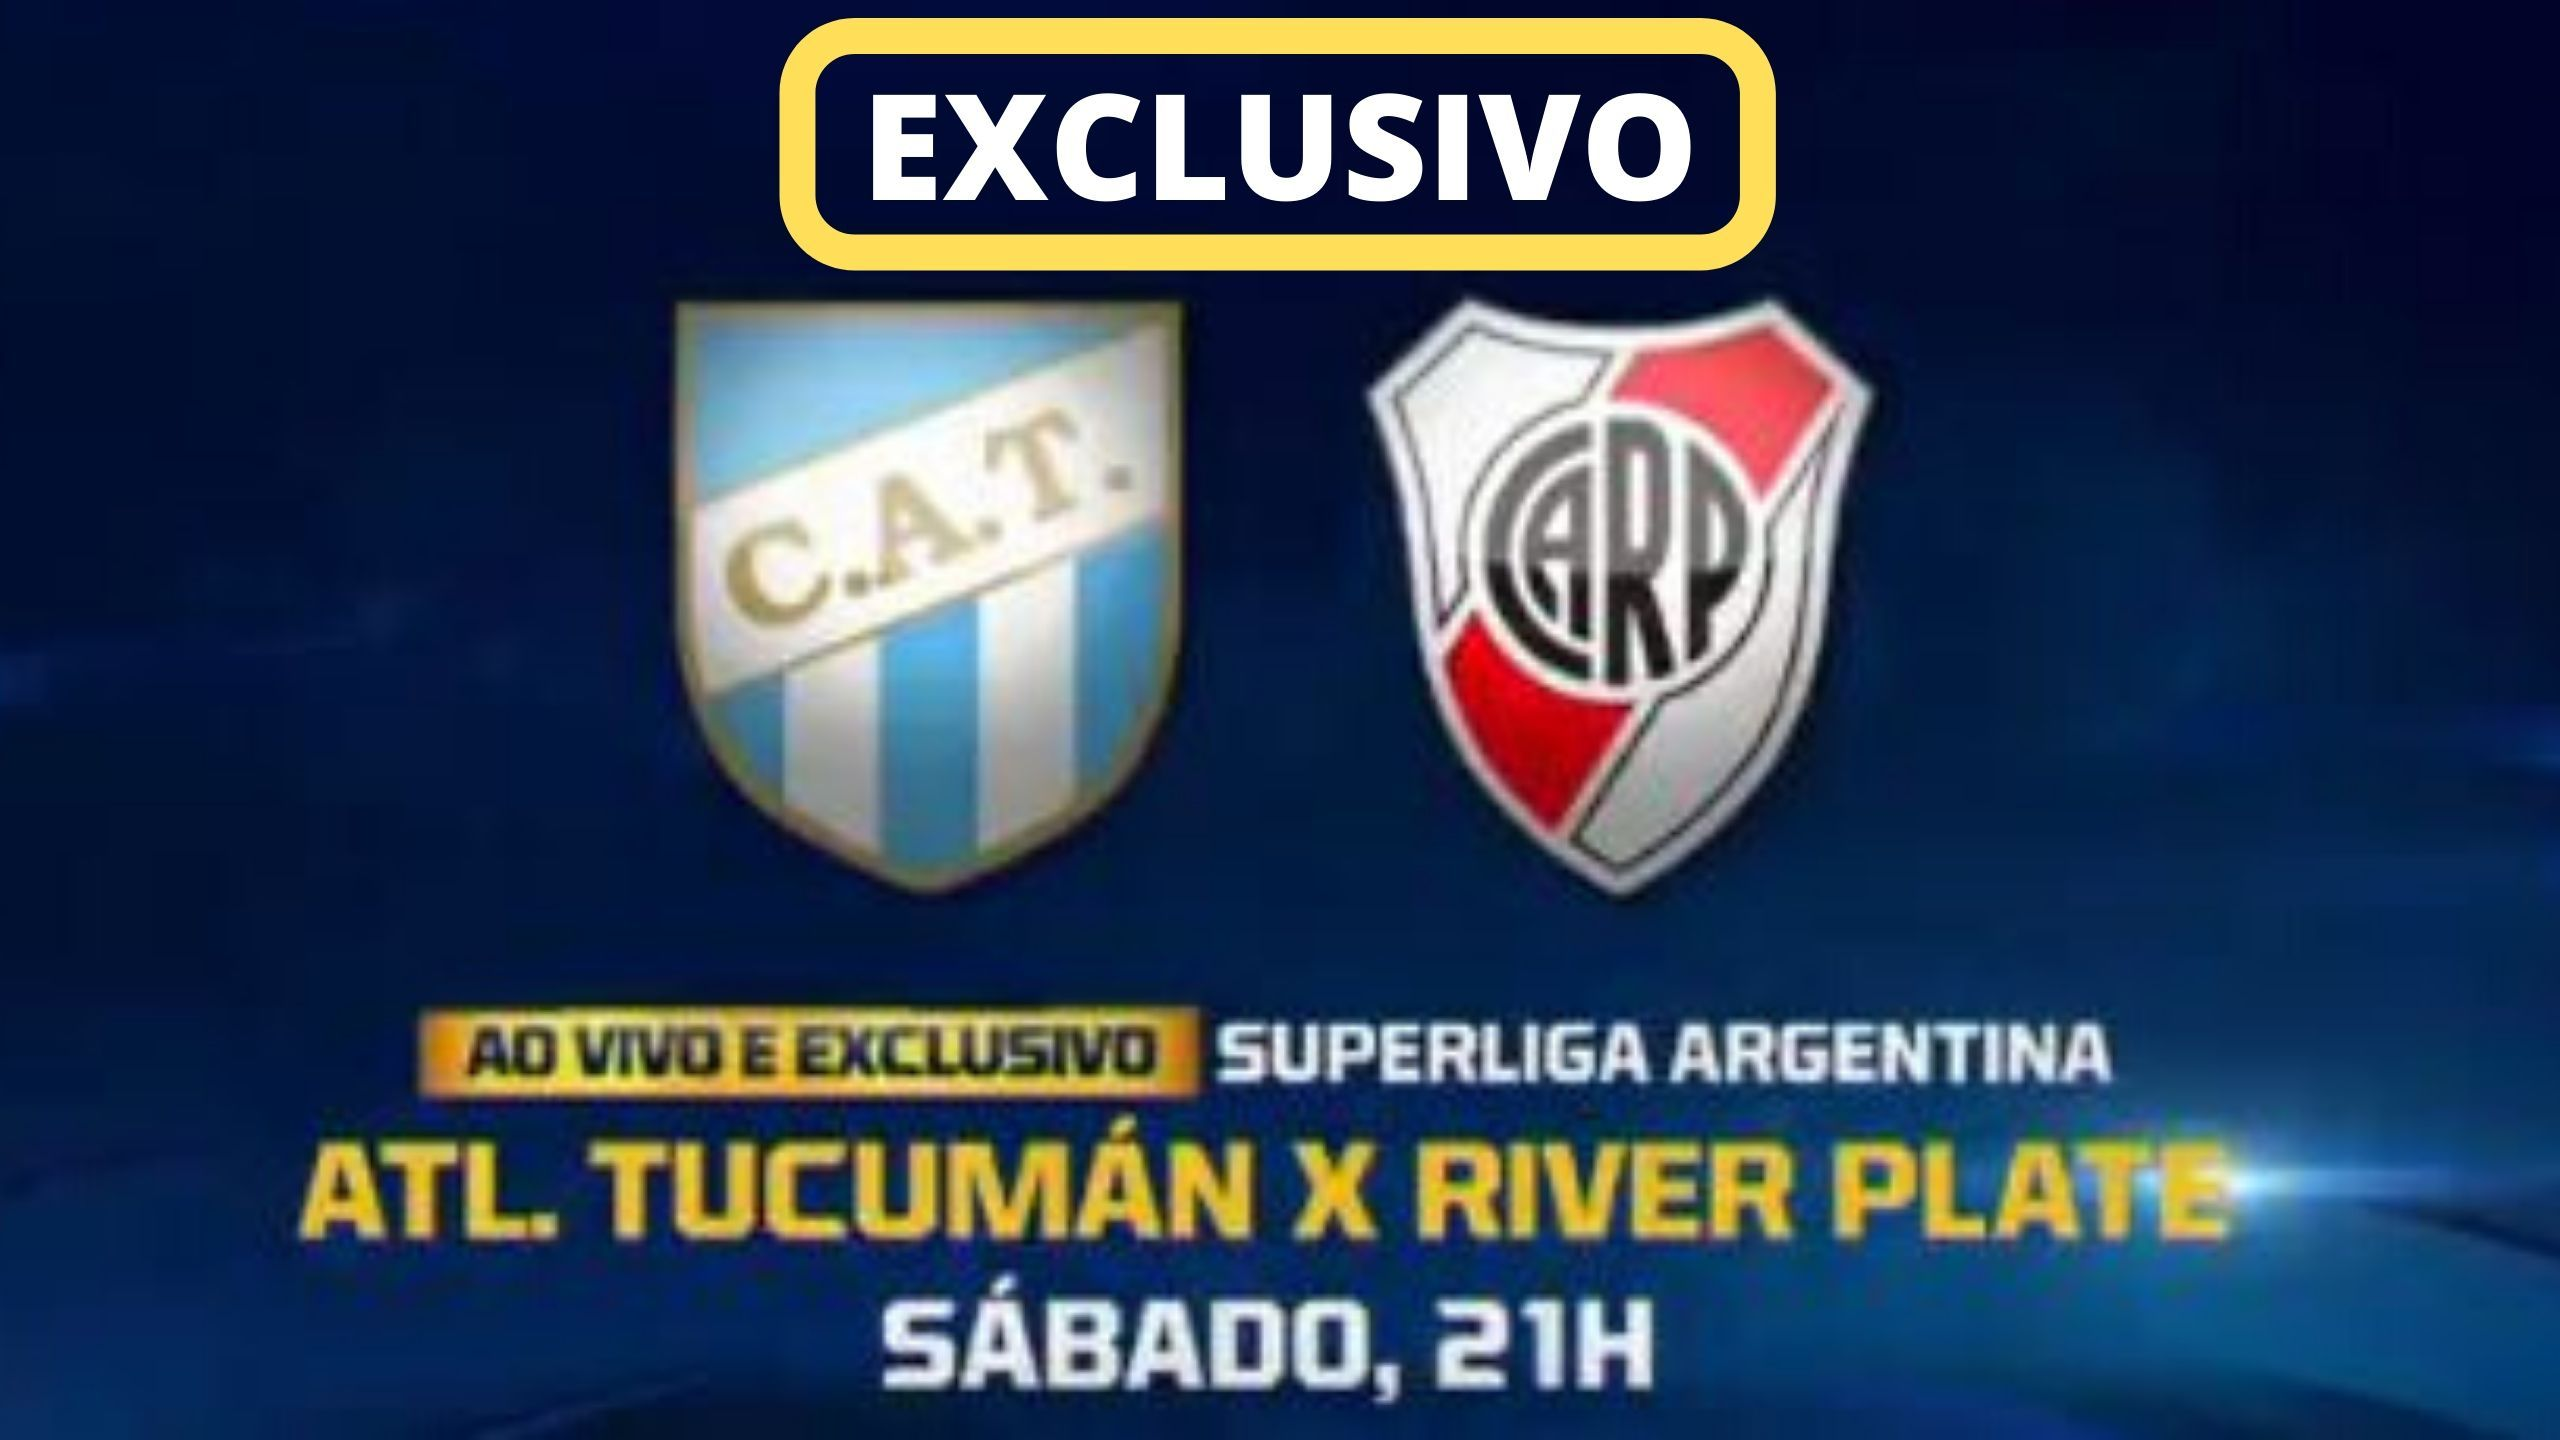 Assistir Atlético Tucumán VS River Plate ao Vivo